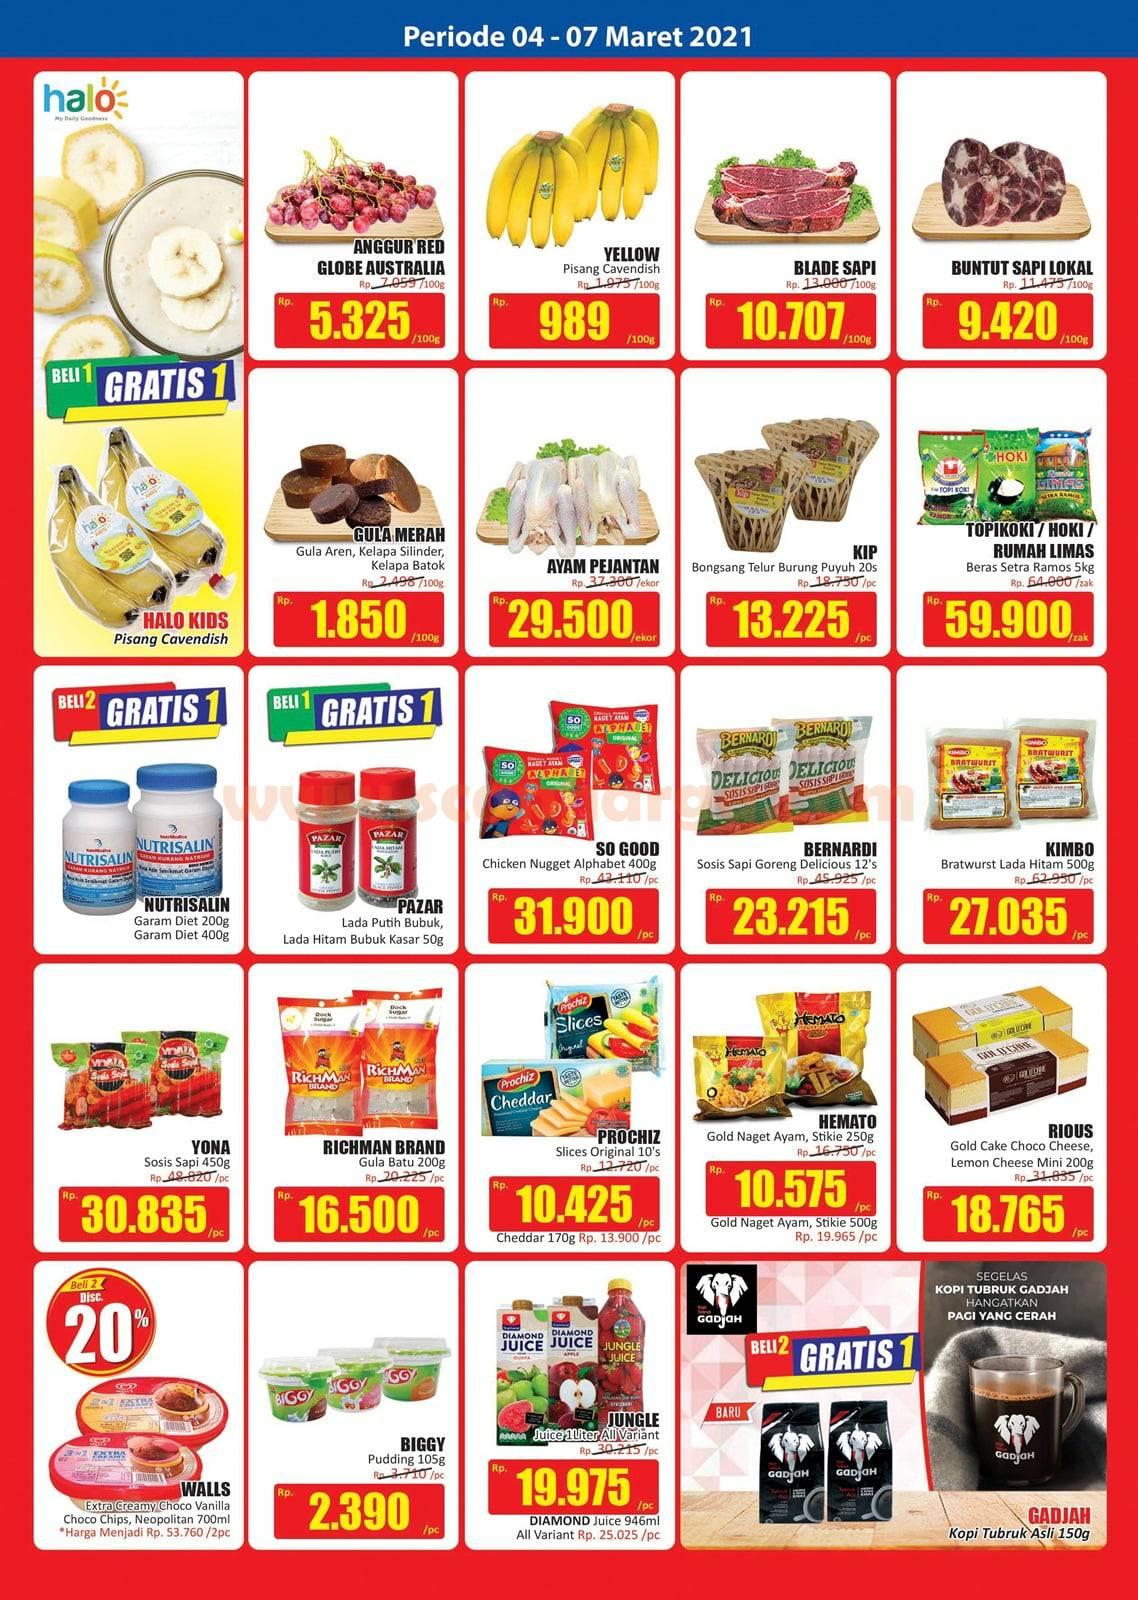 Katalog Promo JSM Hari Hari Swalayan Weekend 4 - 7 Maret 2021 2